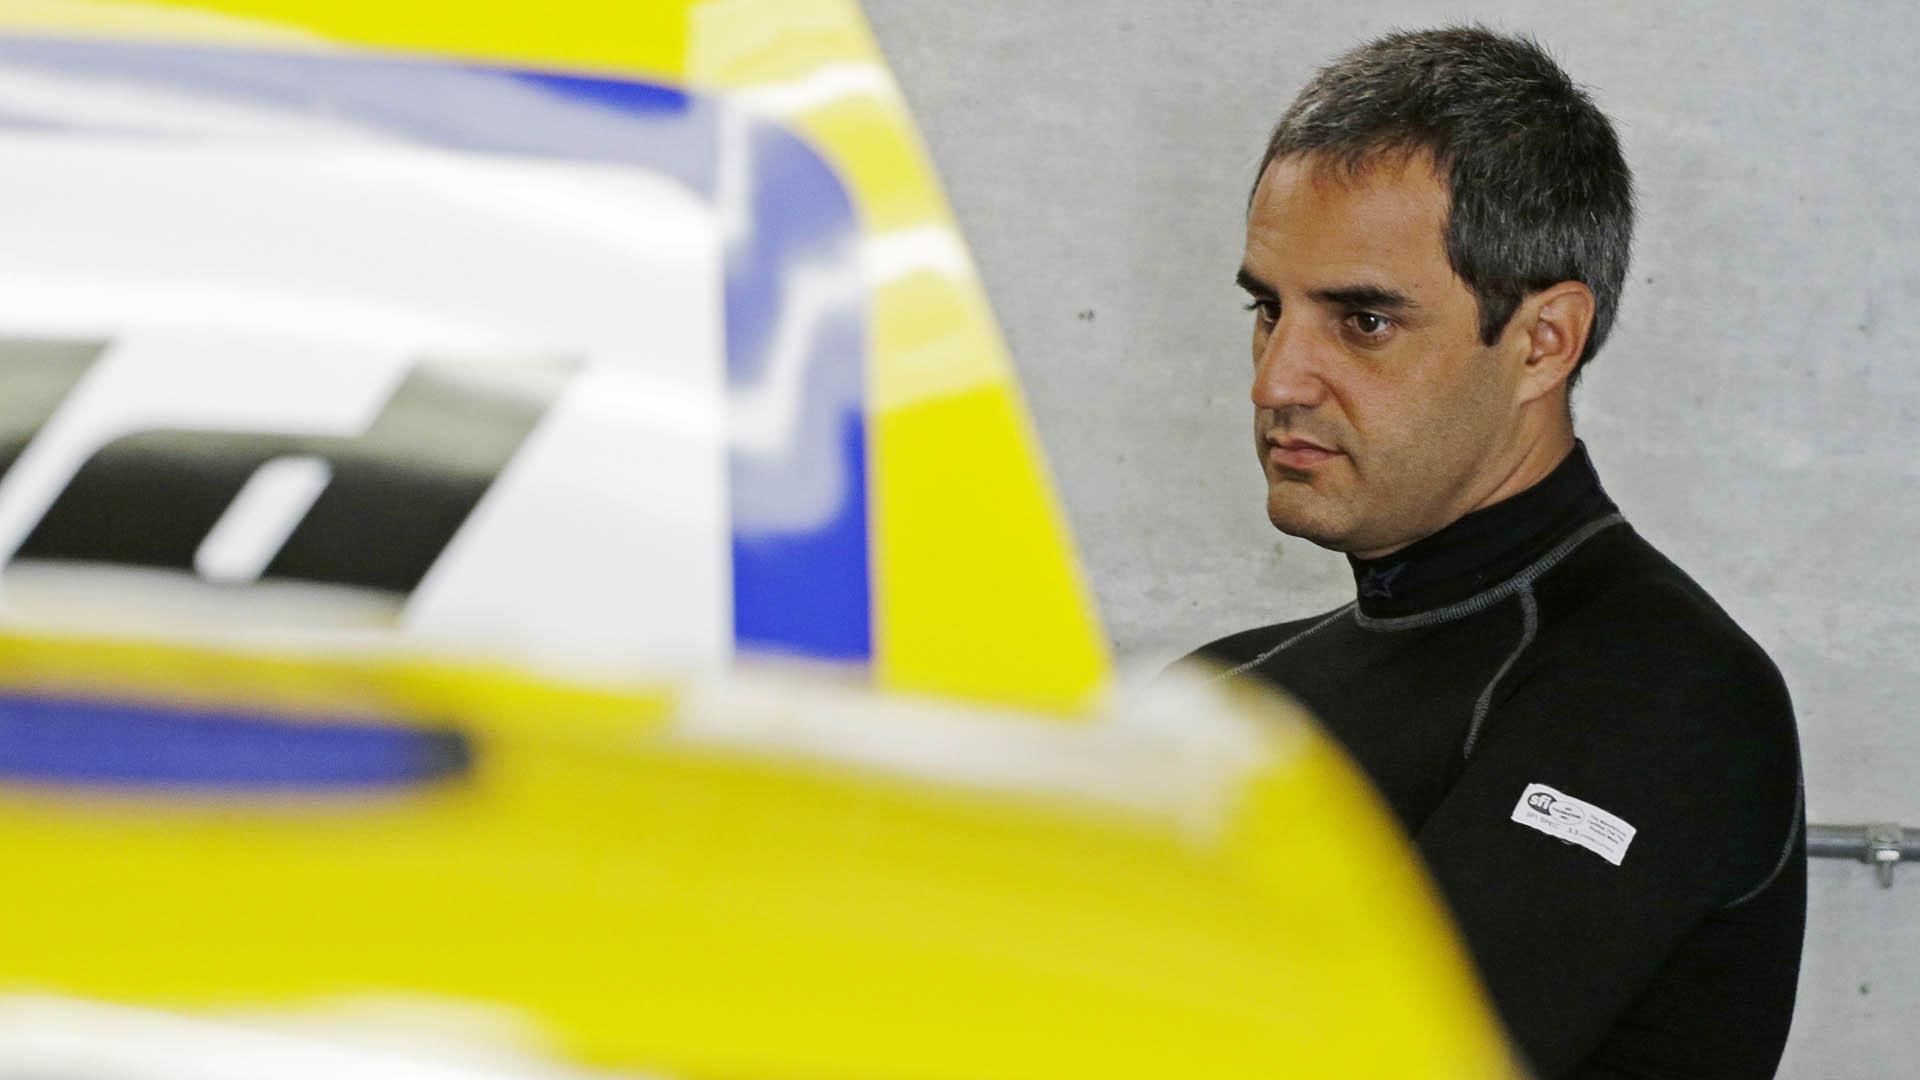 Juan Pablo Montoya-072414-AP-FTR.jpg